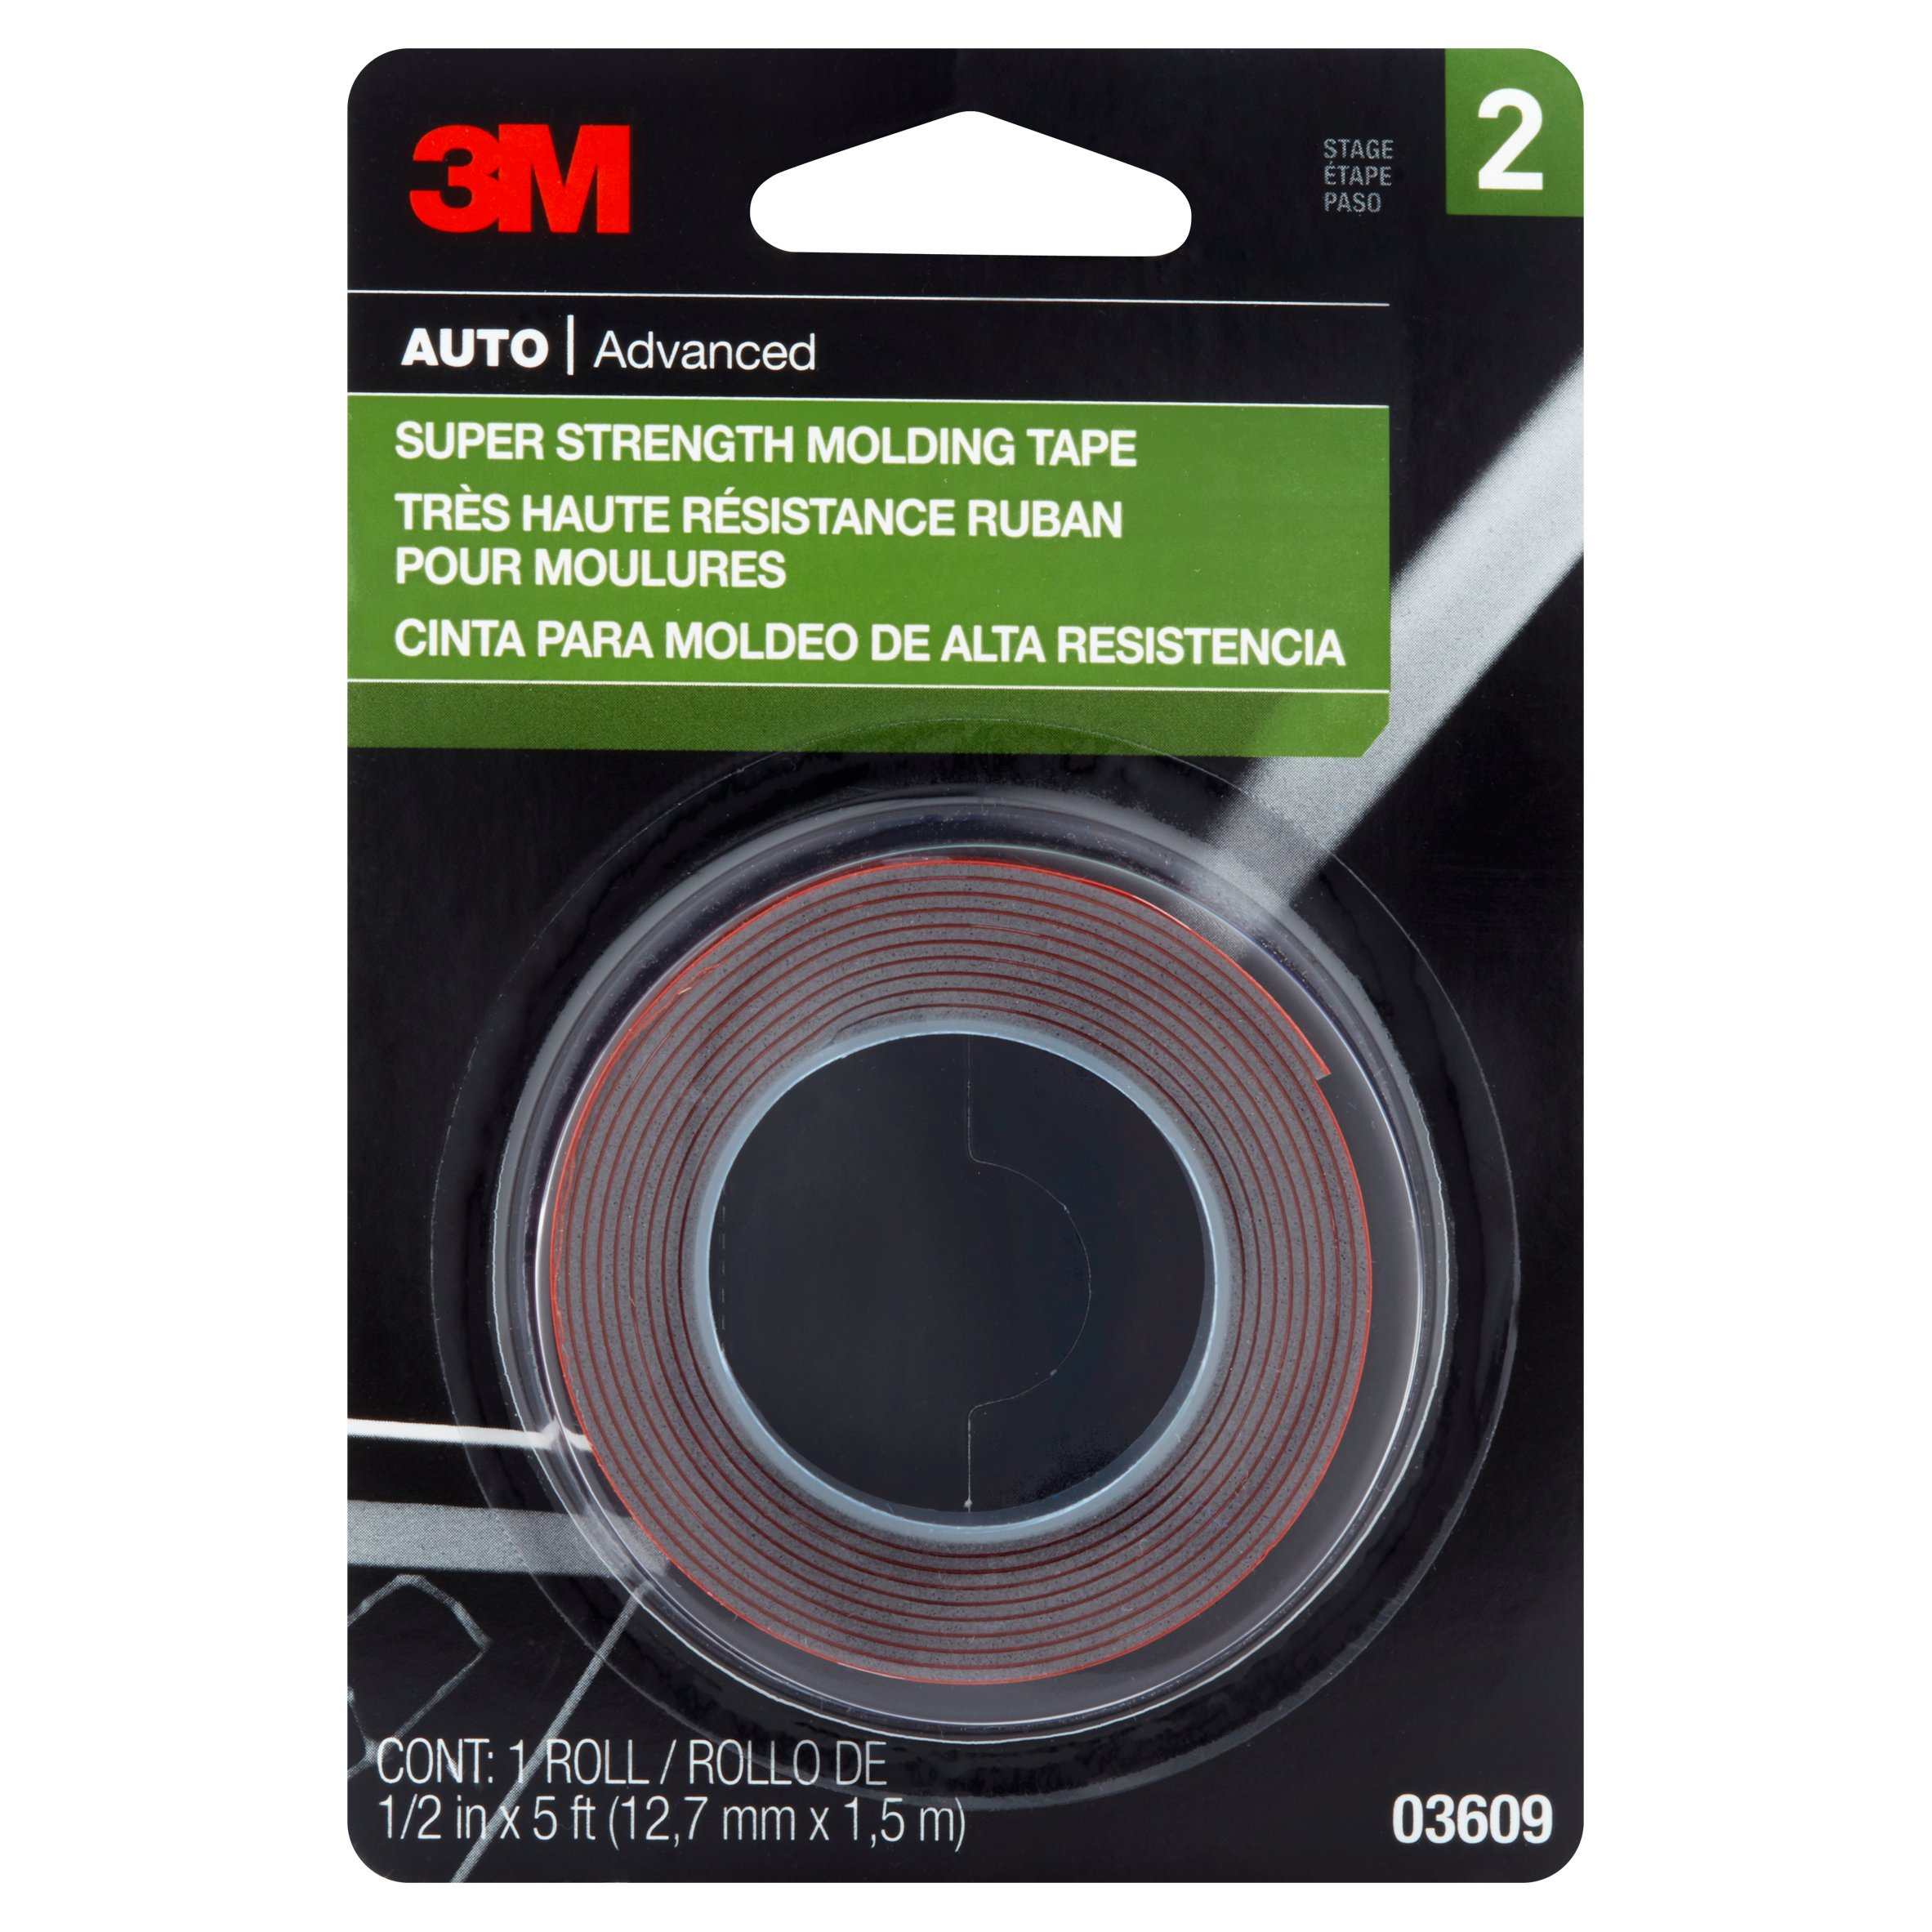 3M Auto Advanced Stage 2 Super Strength Molding Tape